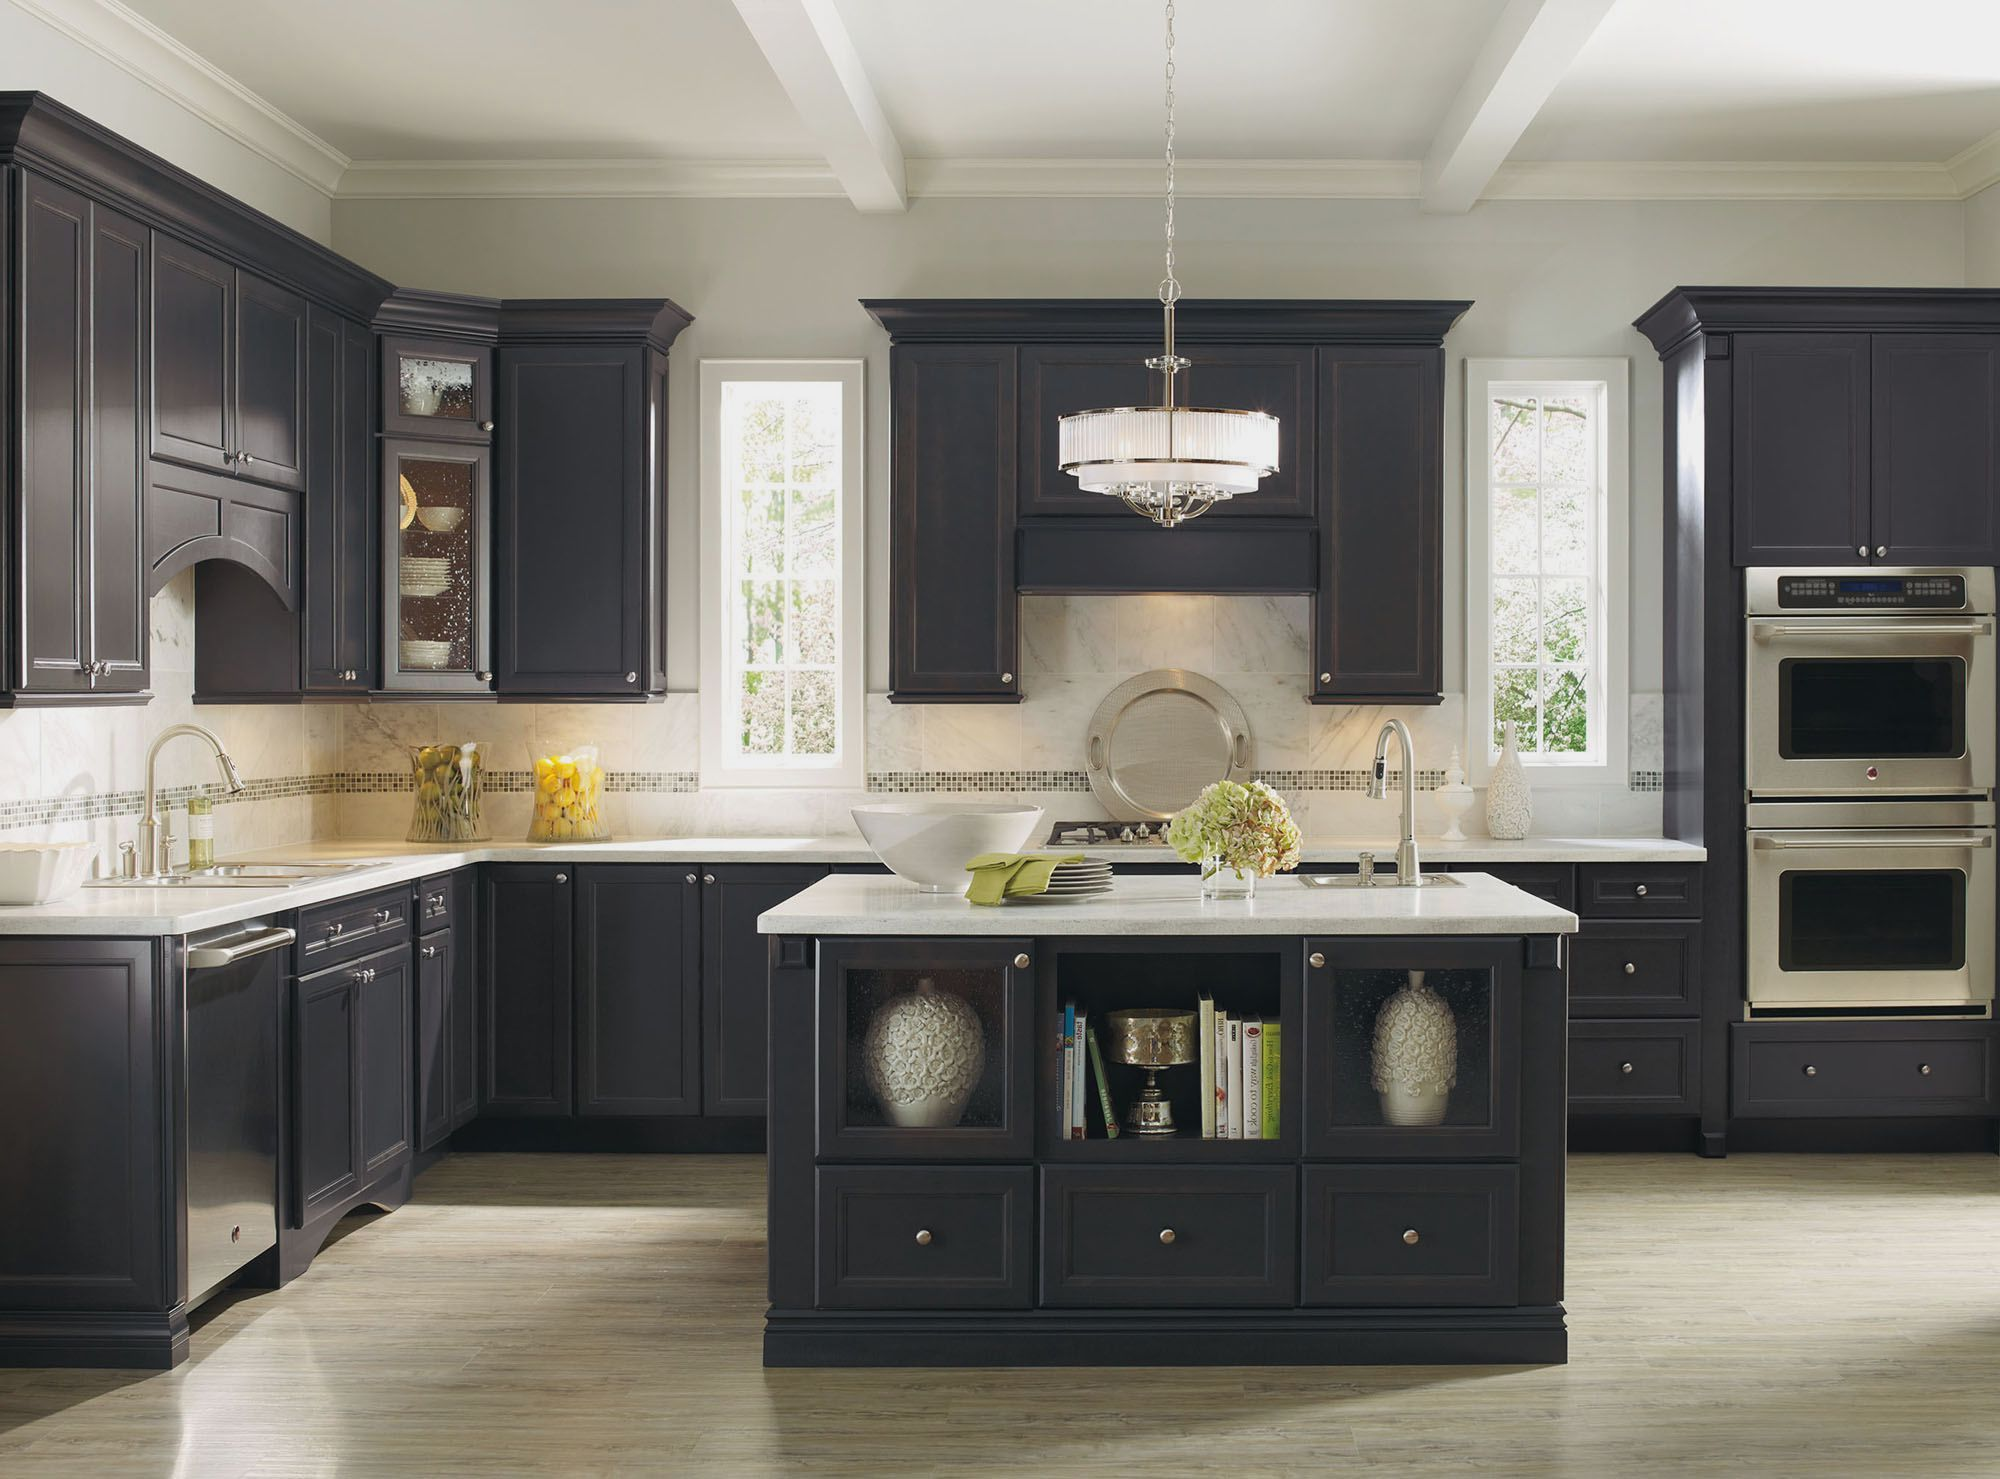 Grey Tiles Ikea Backsplash With Grey Wooden Kitchen Cabi